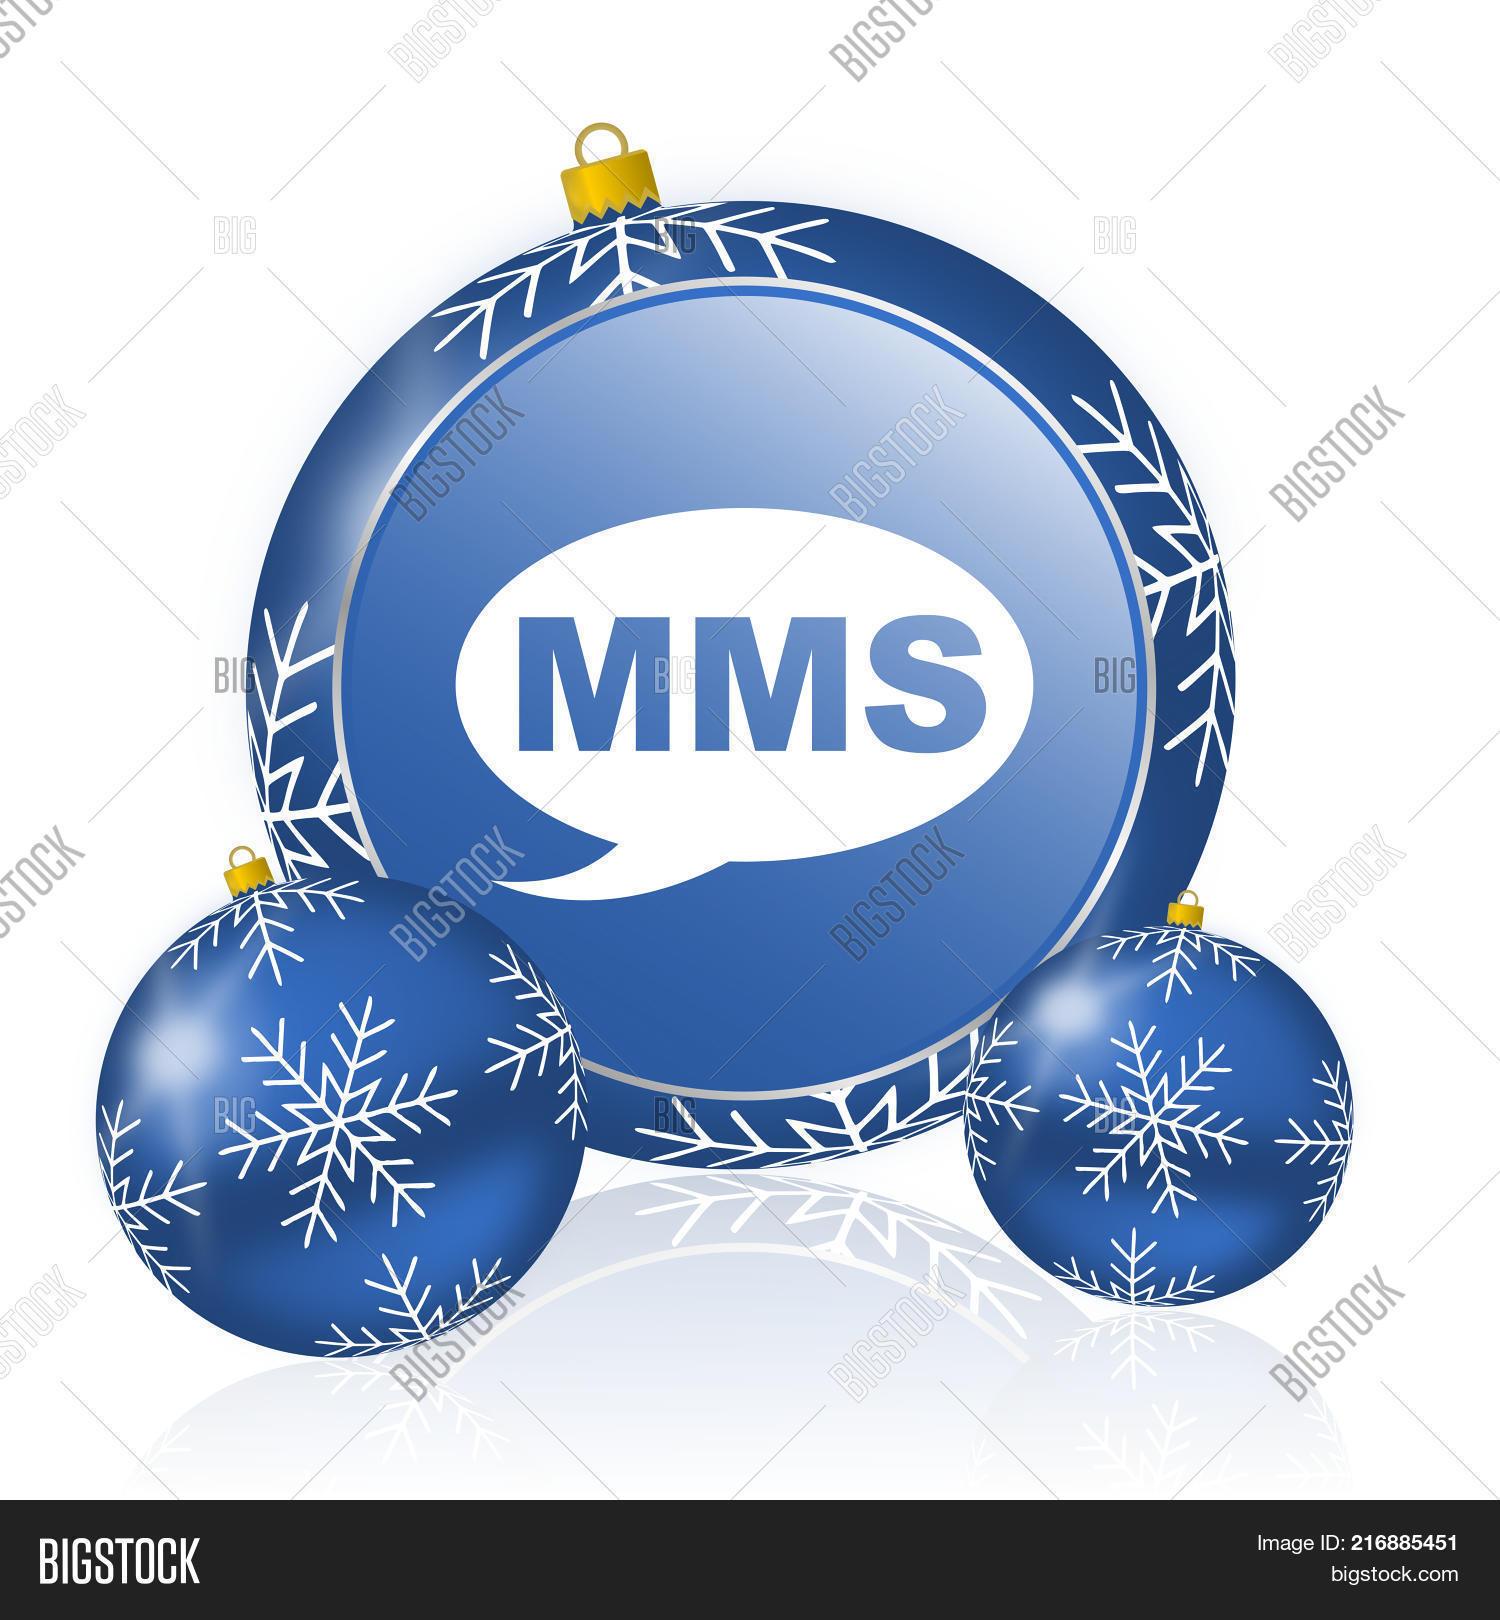 Mms Blue Christmas Image & Photo (Free Trial) | Bigstock